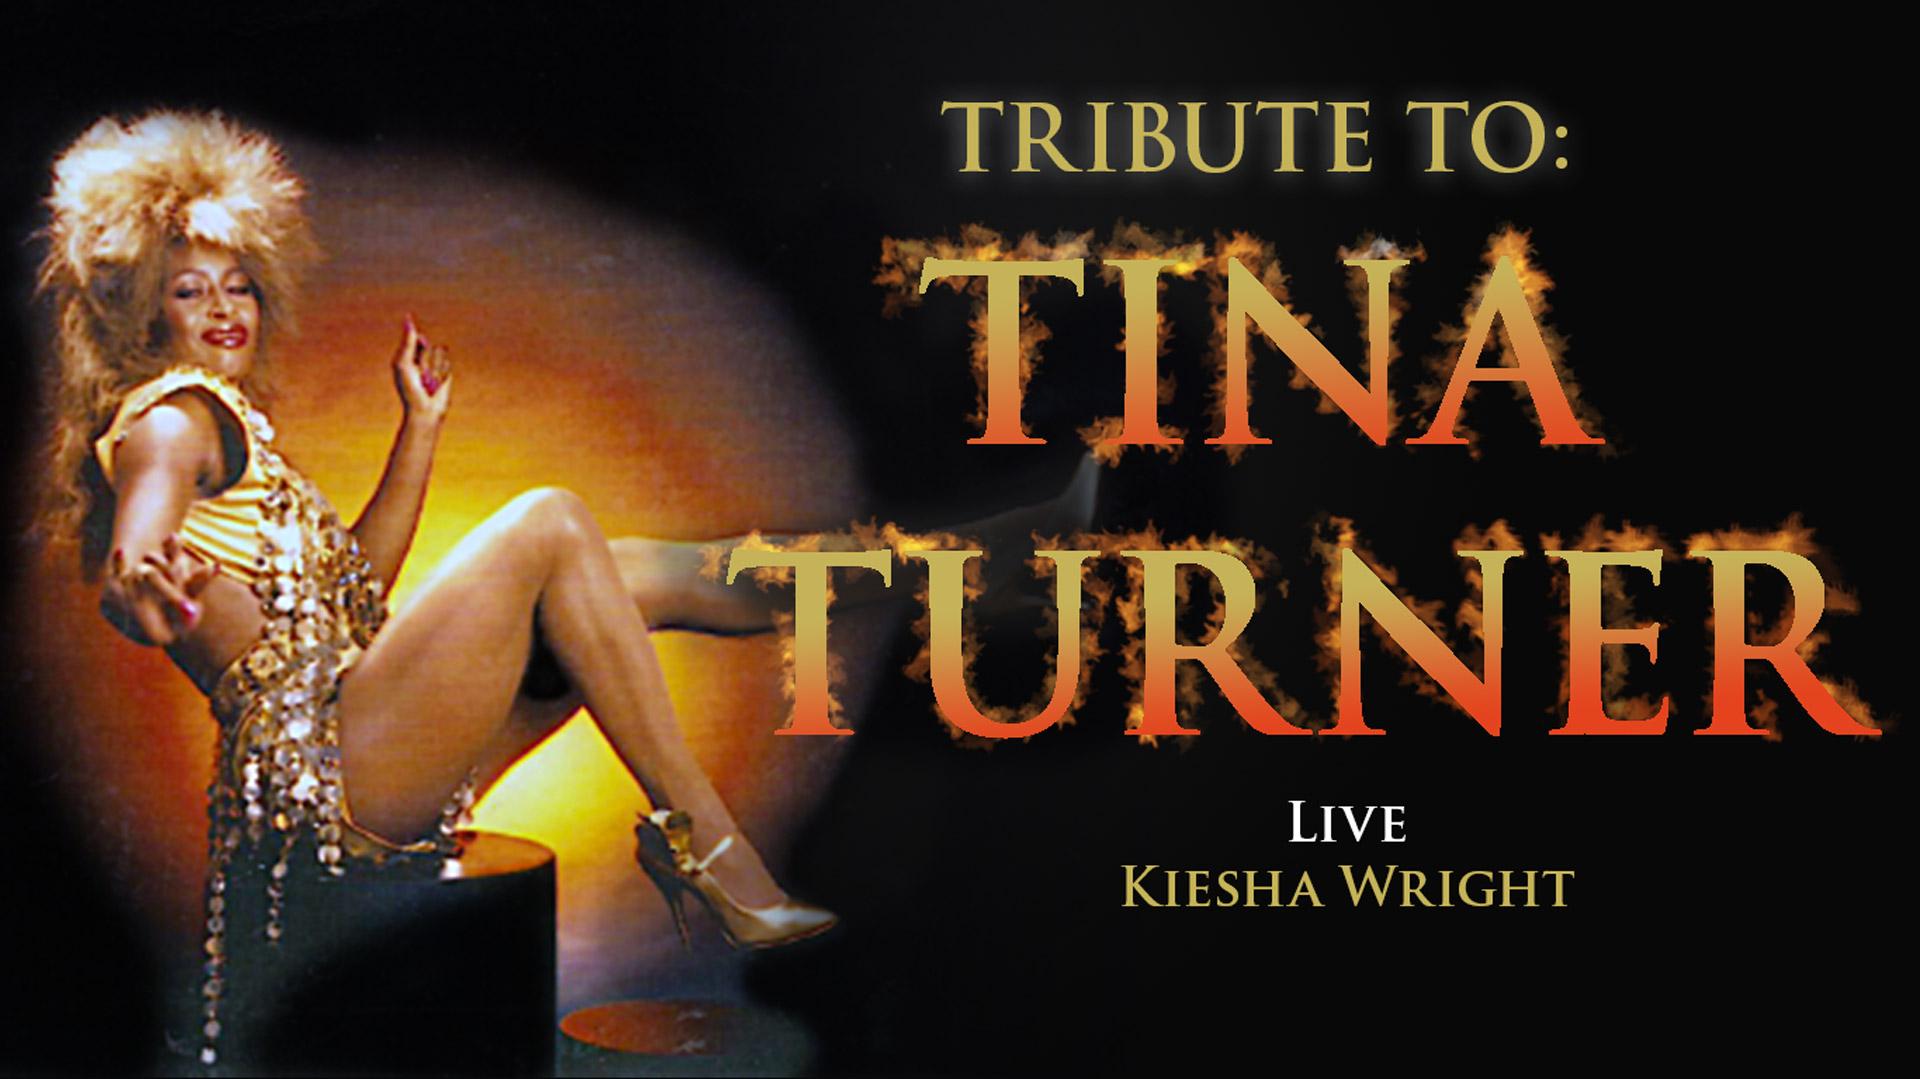 KIESHA WRIGHT tribute to tina turner